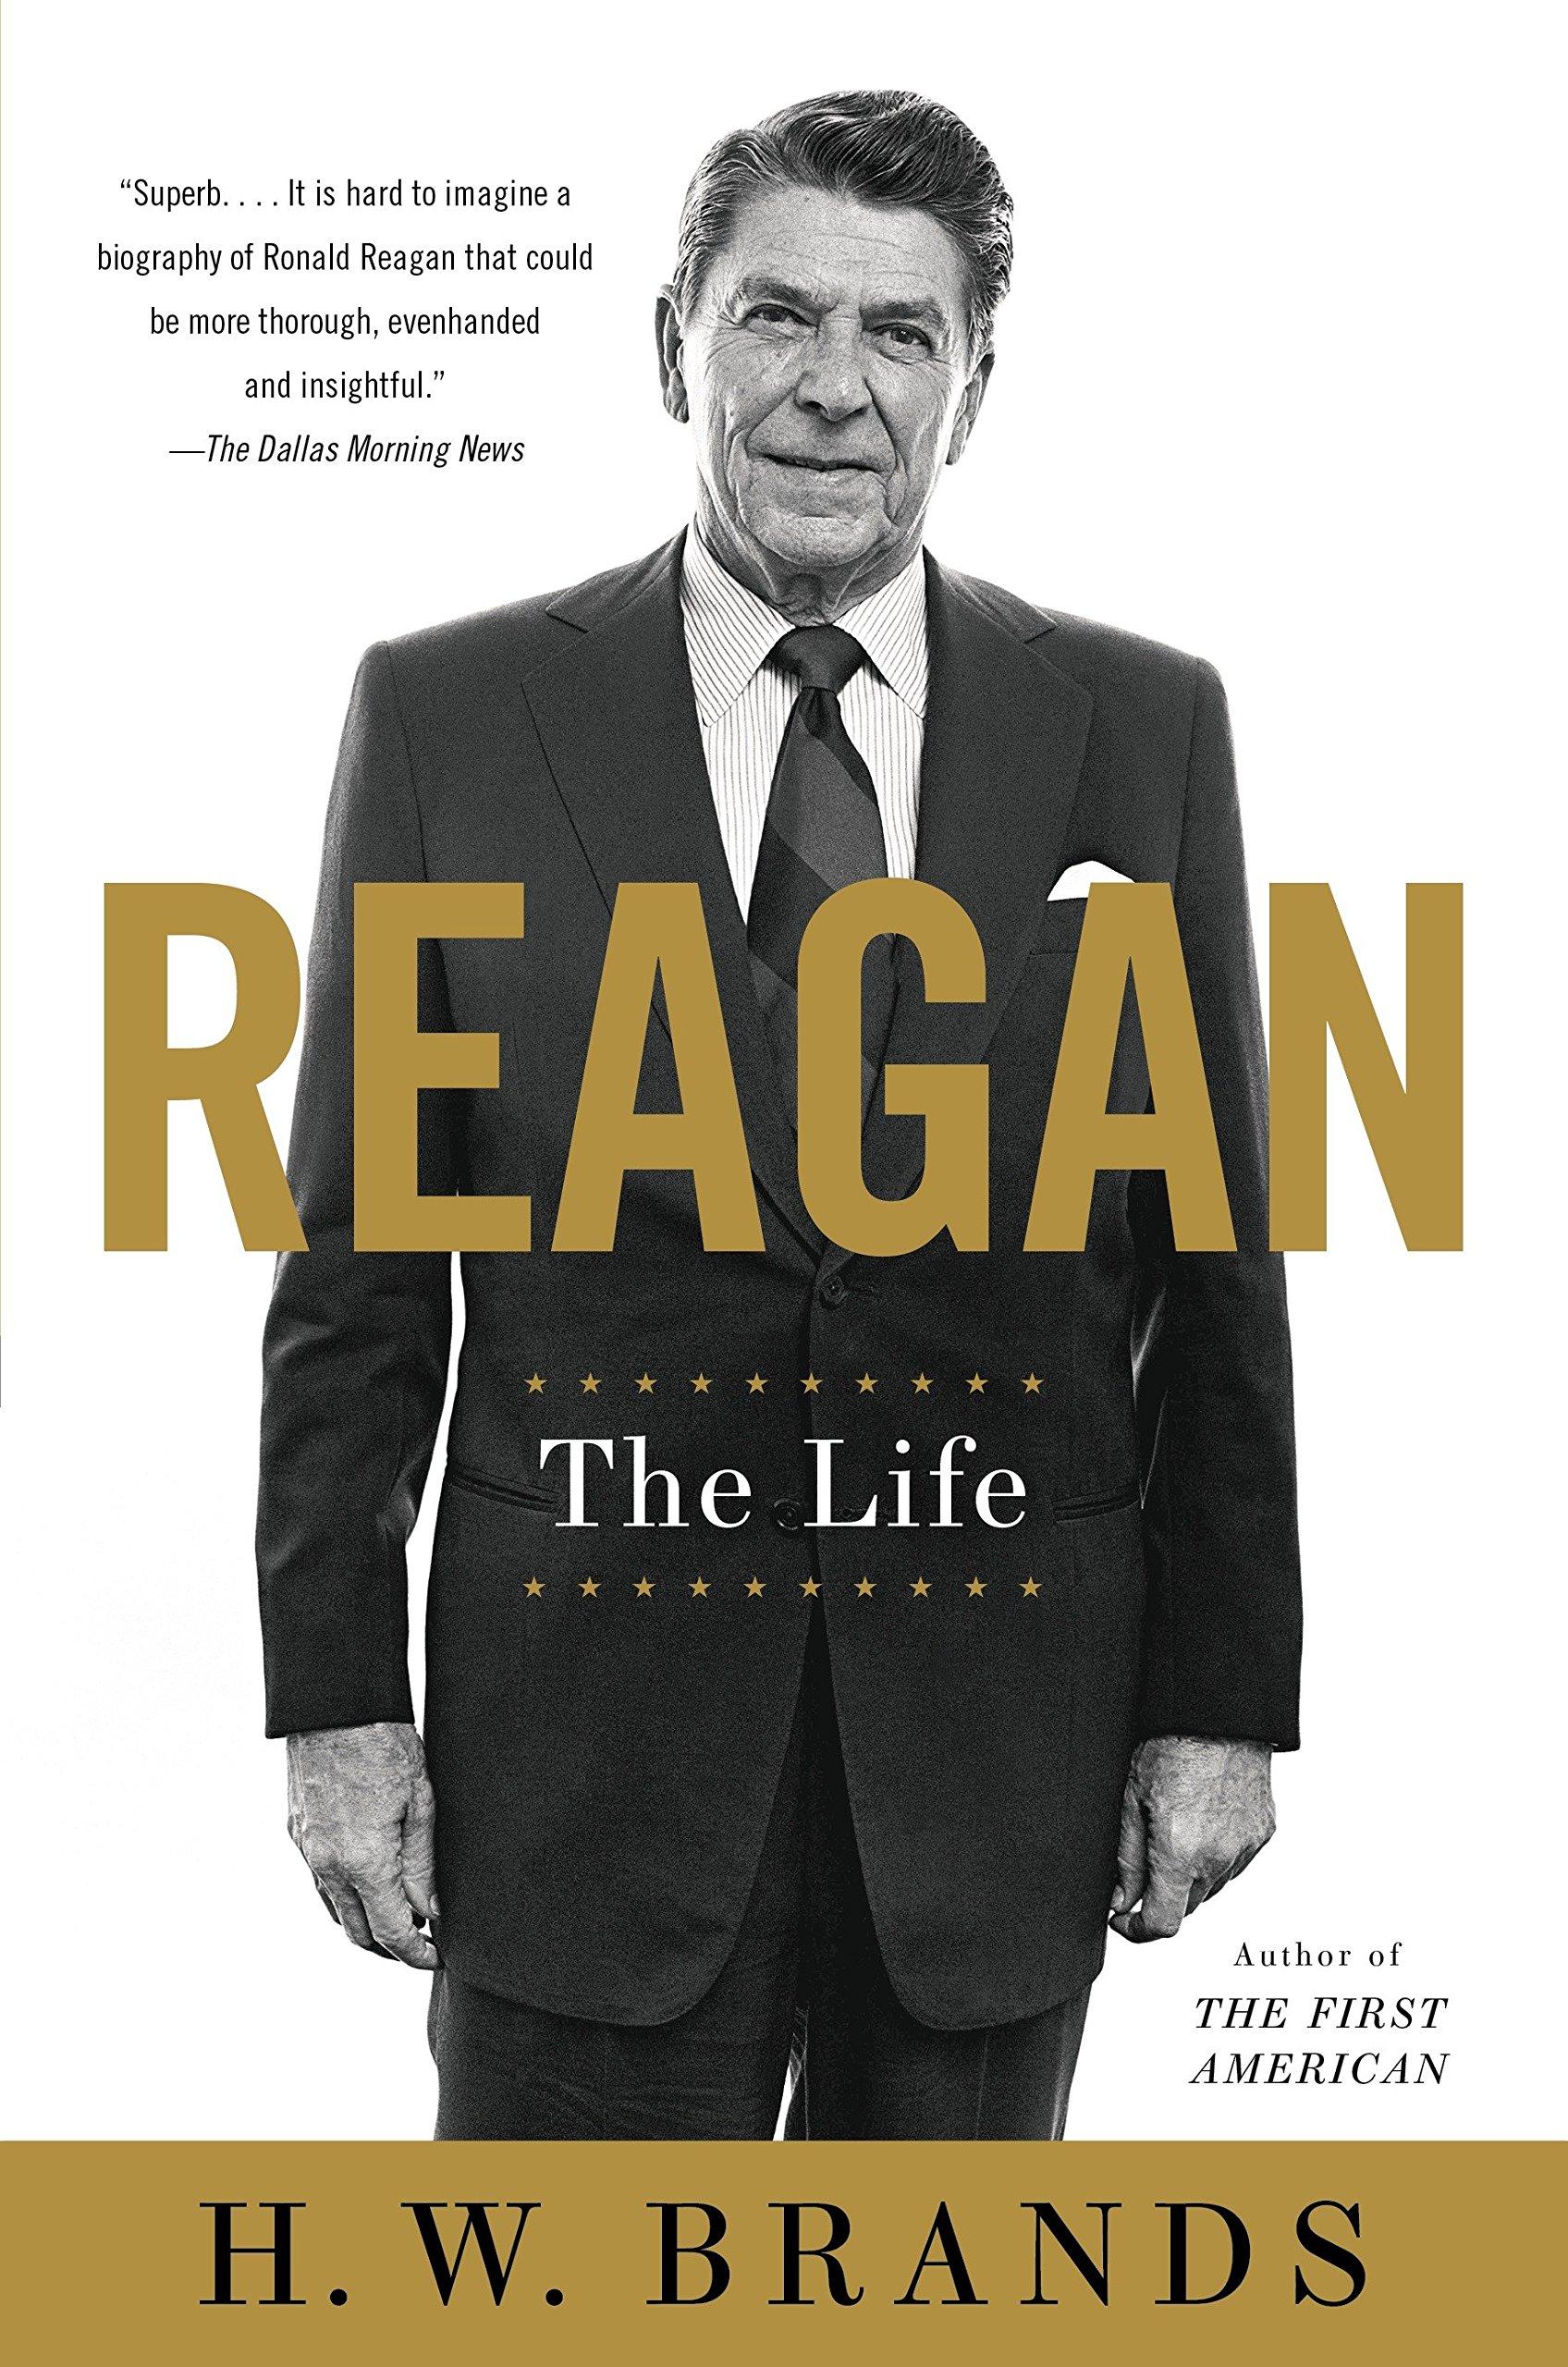 Reagan biography